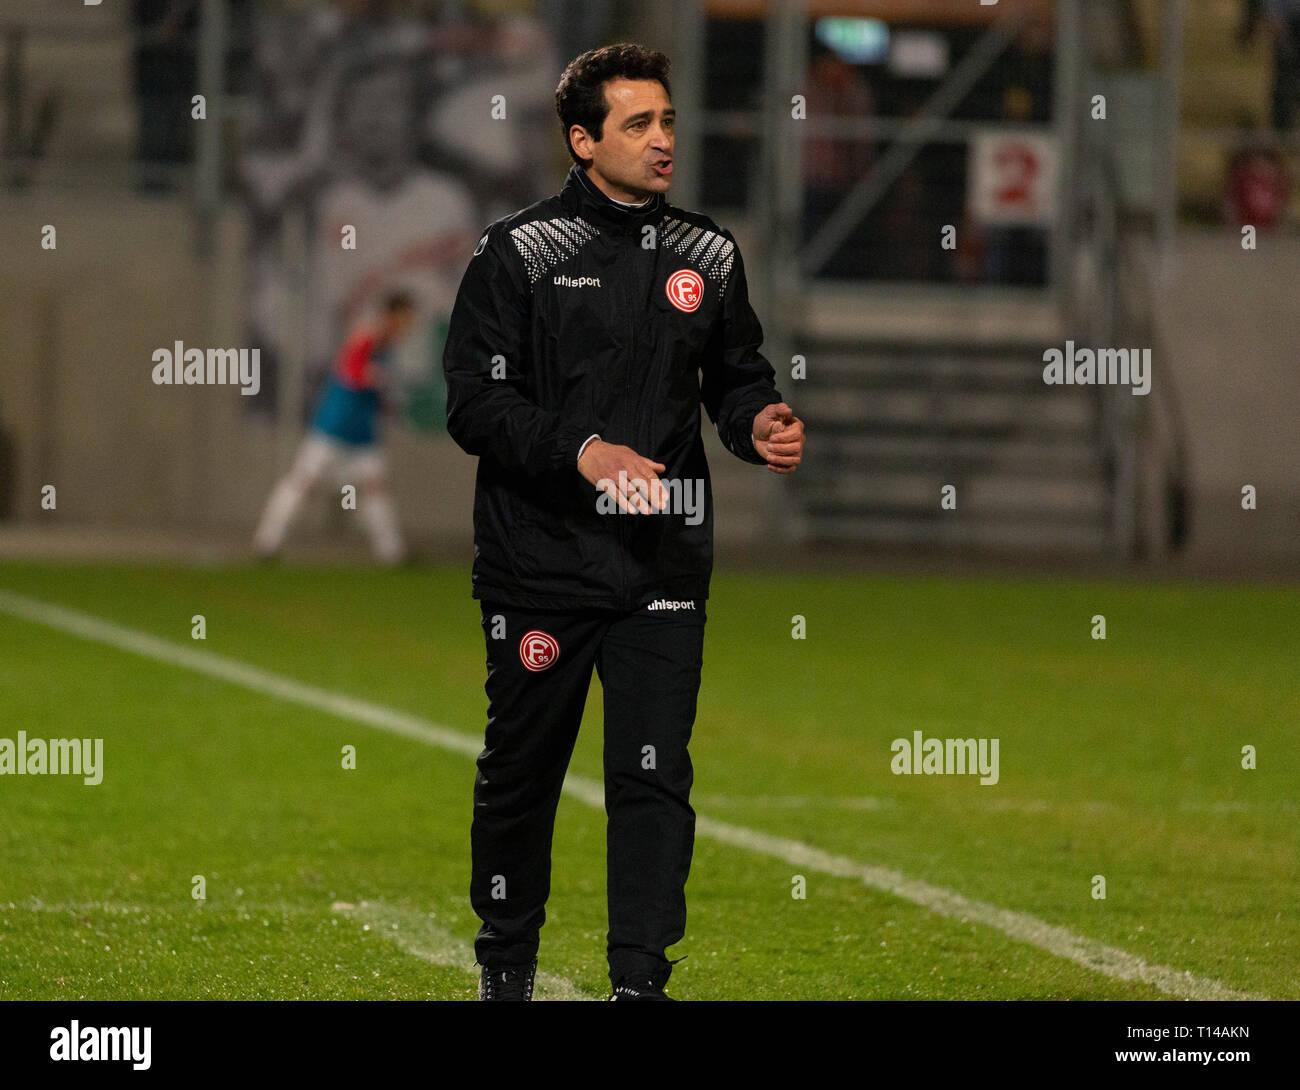 sports, football, Regional League West, 2018/2019, Rot Weiss Oberhausen vs Fortuna Duesseldorf U23 3-3, Stadium Niederrhein in Oberhausen, head coach Nico Michaty (Fortuna) - Stock Image